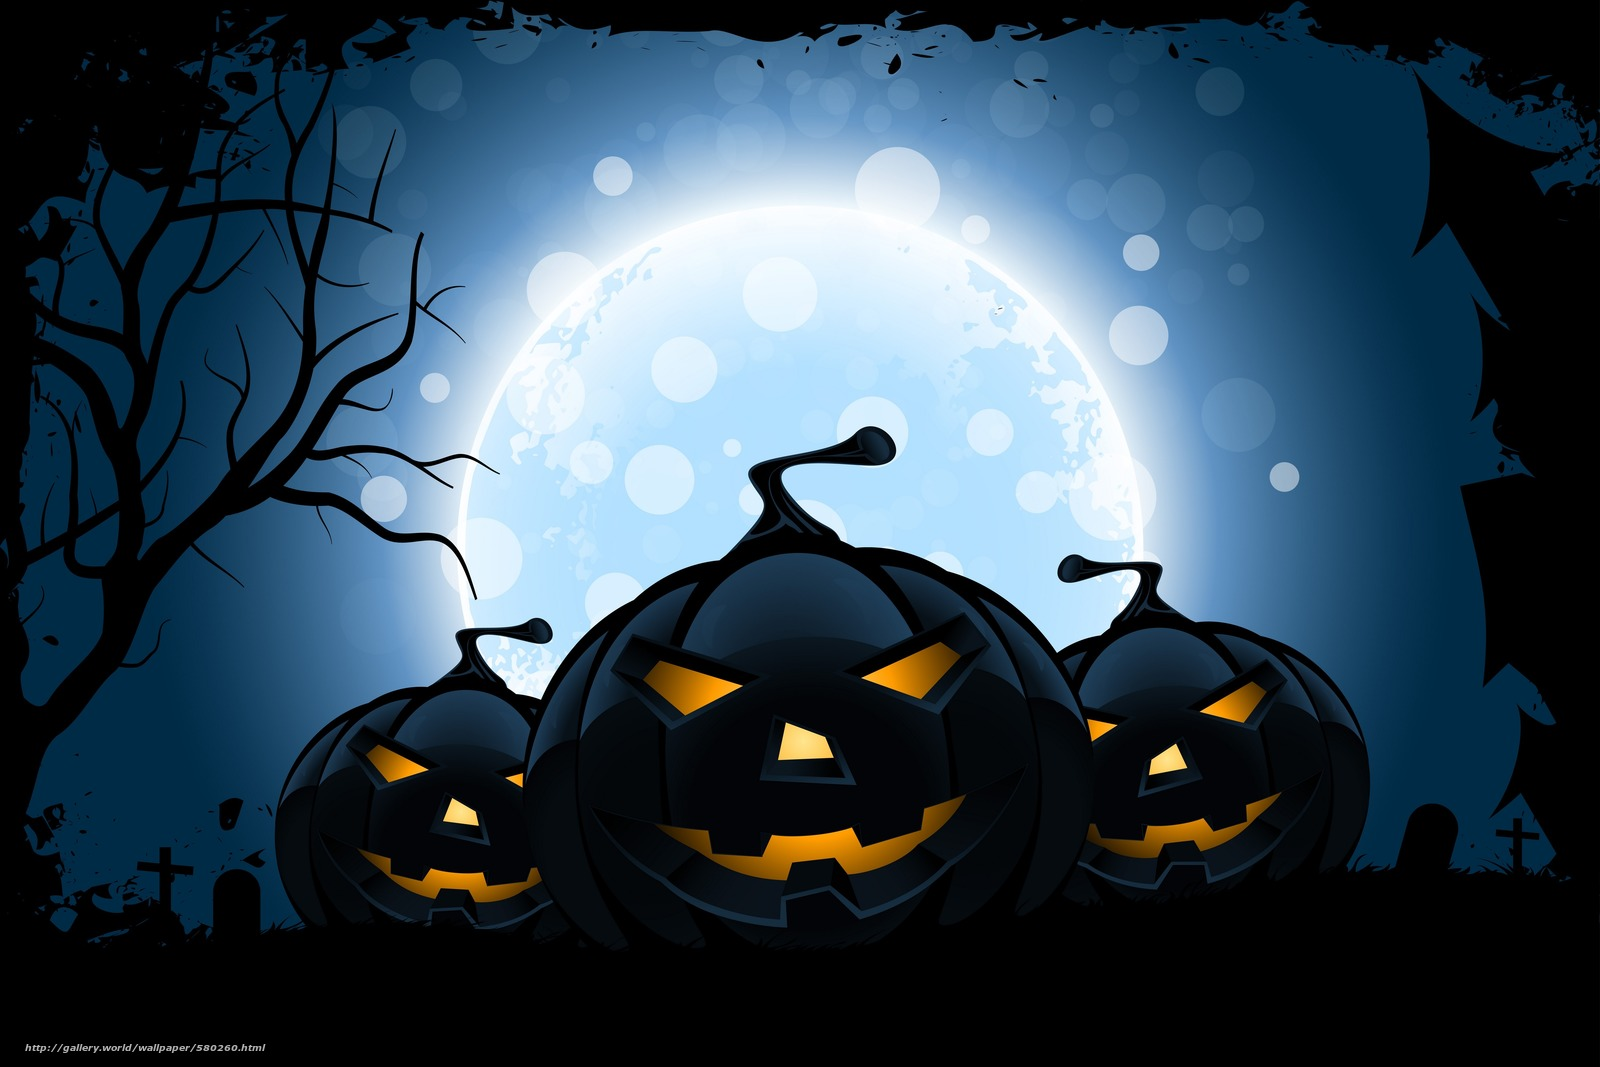 Tlcharger fond d 39 ecran halloween horreur de vacances - Image halloween drole ...